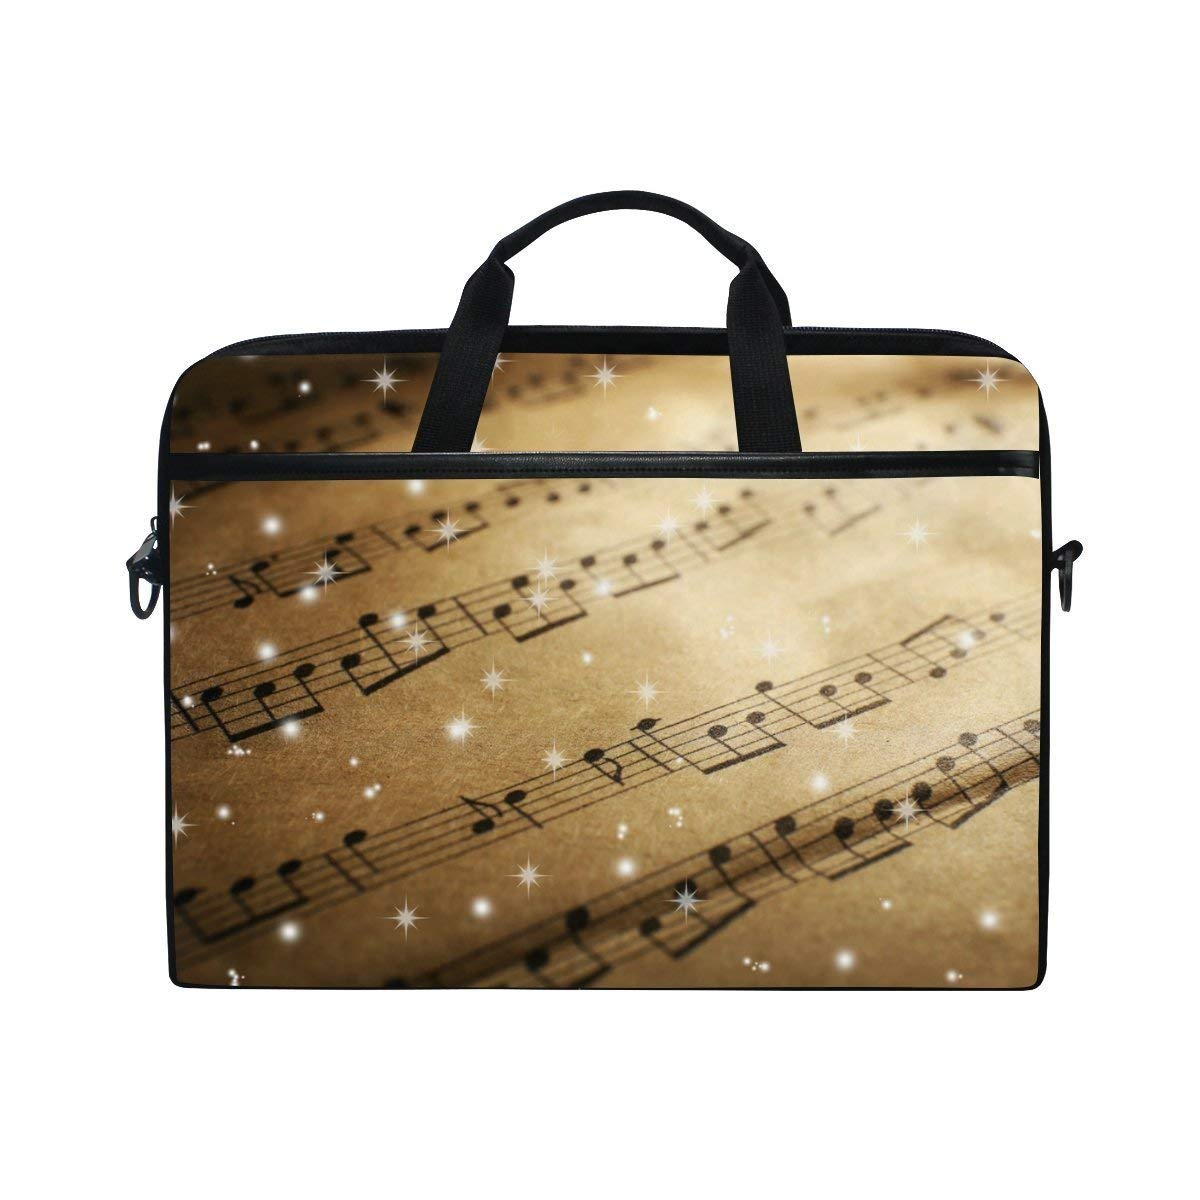 0ec14d9e8b Get Quotations · YQINING Bling Music Sheet Laptop Bag Briefcase Shoulder Messenger  Bag for Men and Women Fits 15